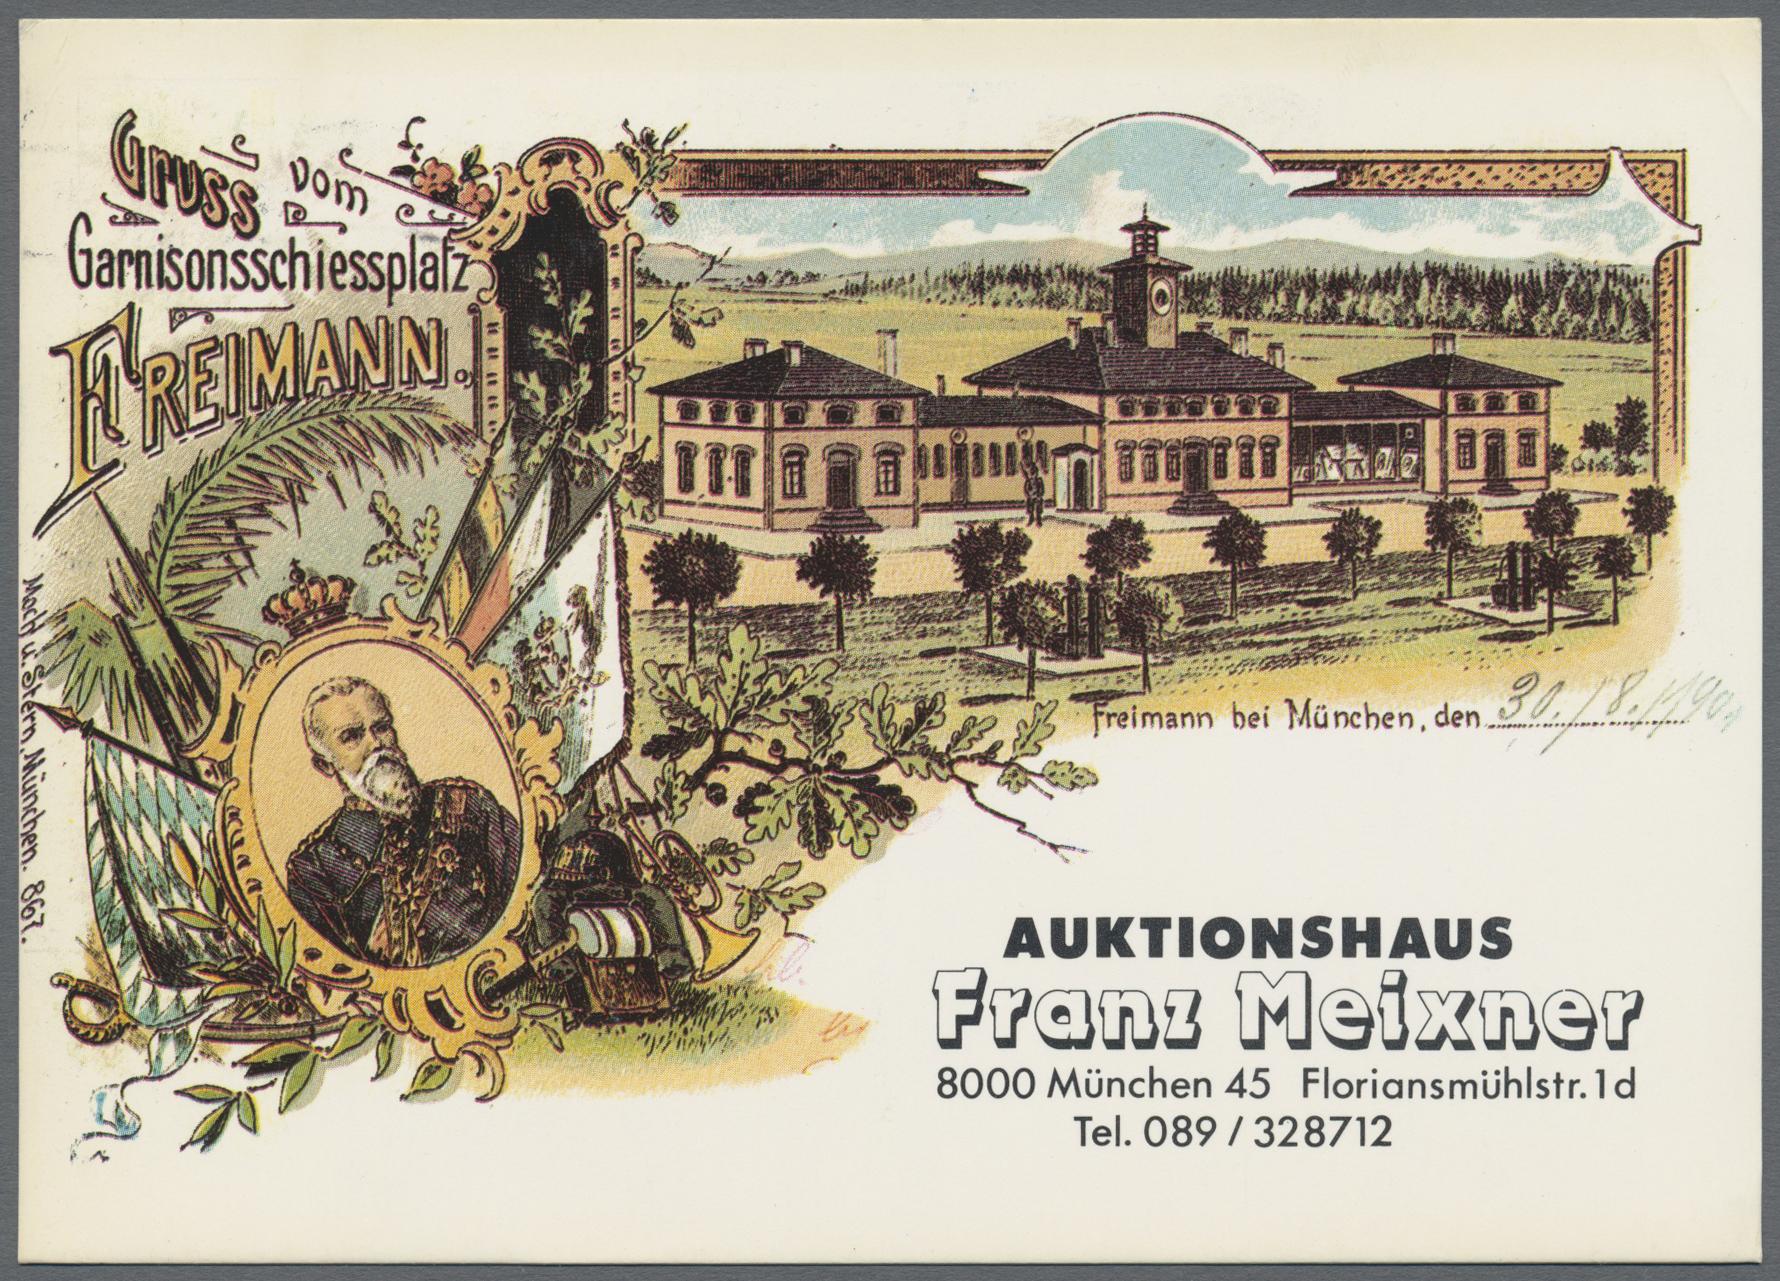 Lot 04139 - ansichtskarten: motive / thematics  -  Auktionshaus Christoph Gärtner GmbH & Co. KG Special auction